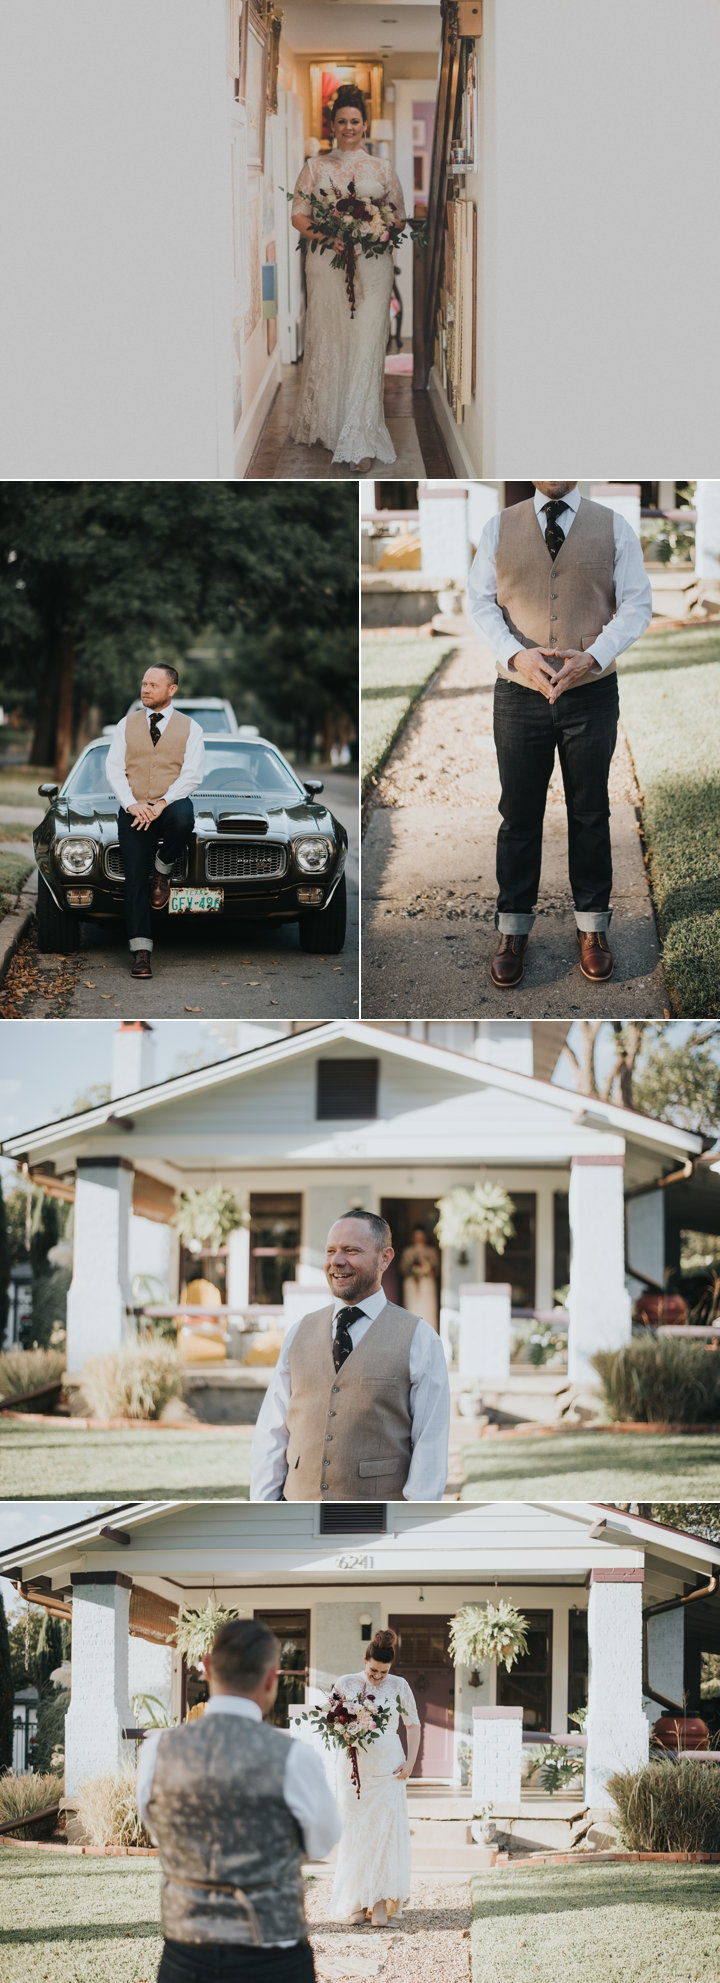 dallas-wedding-photographers-jp 7.jpg